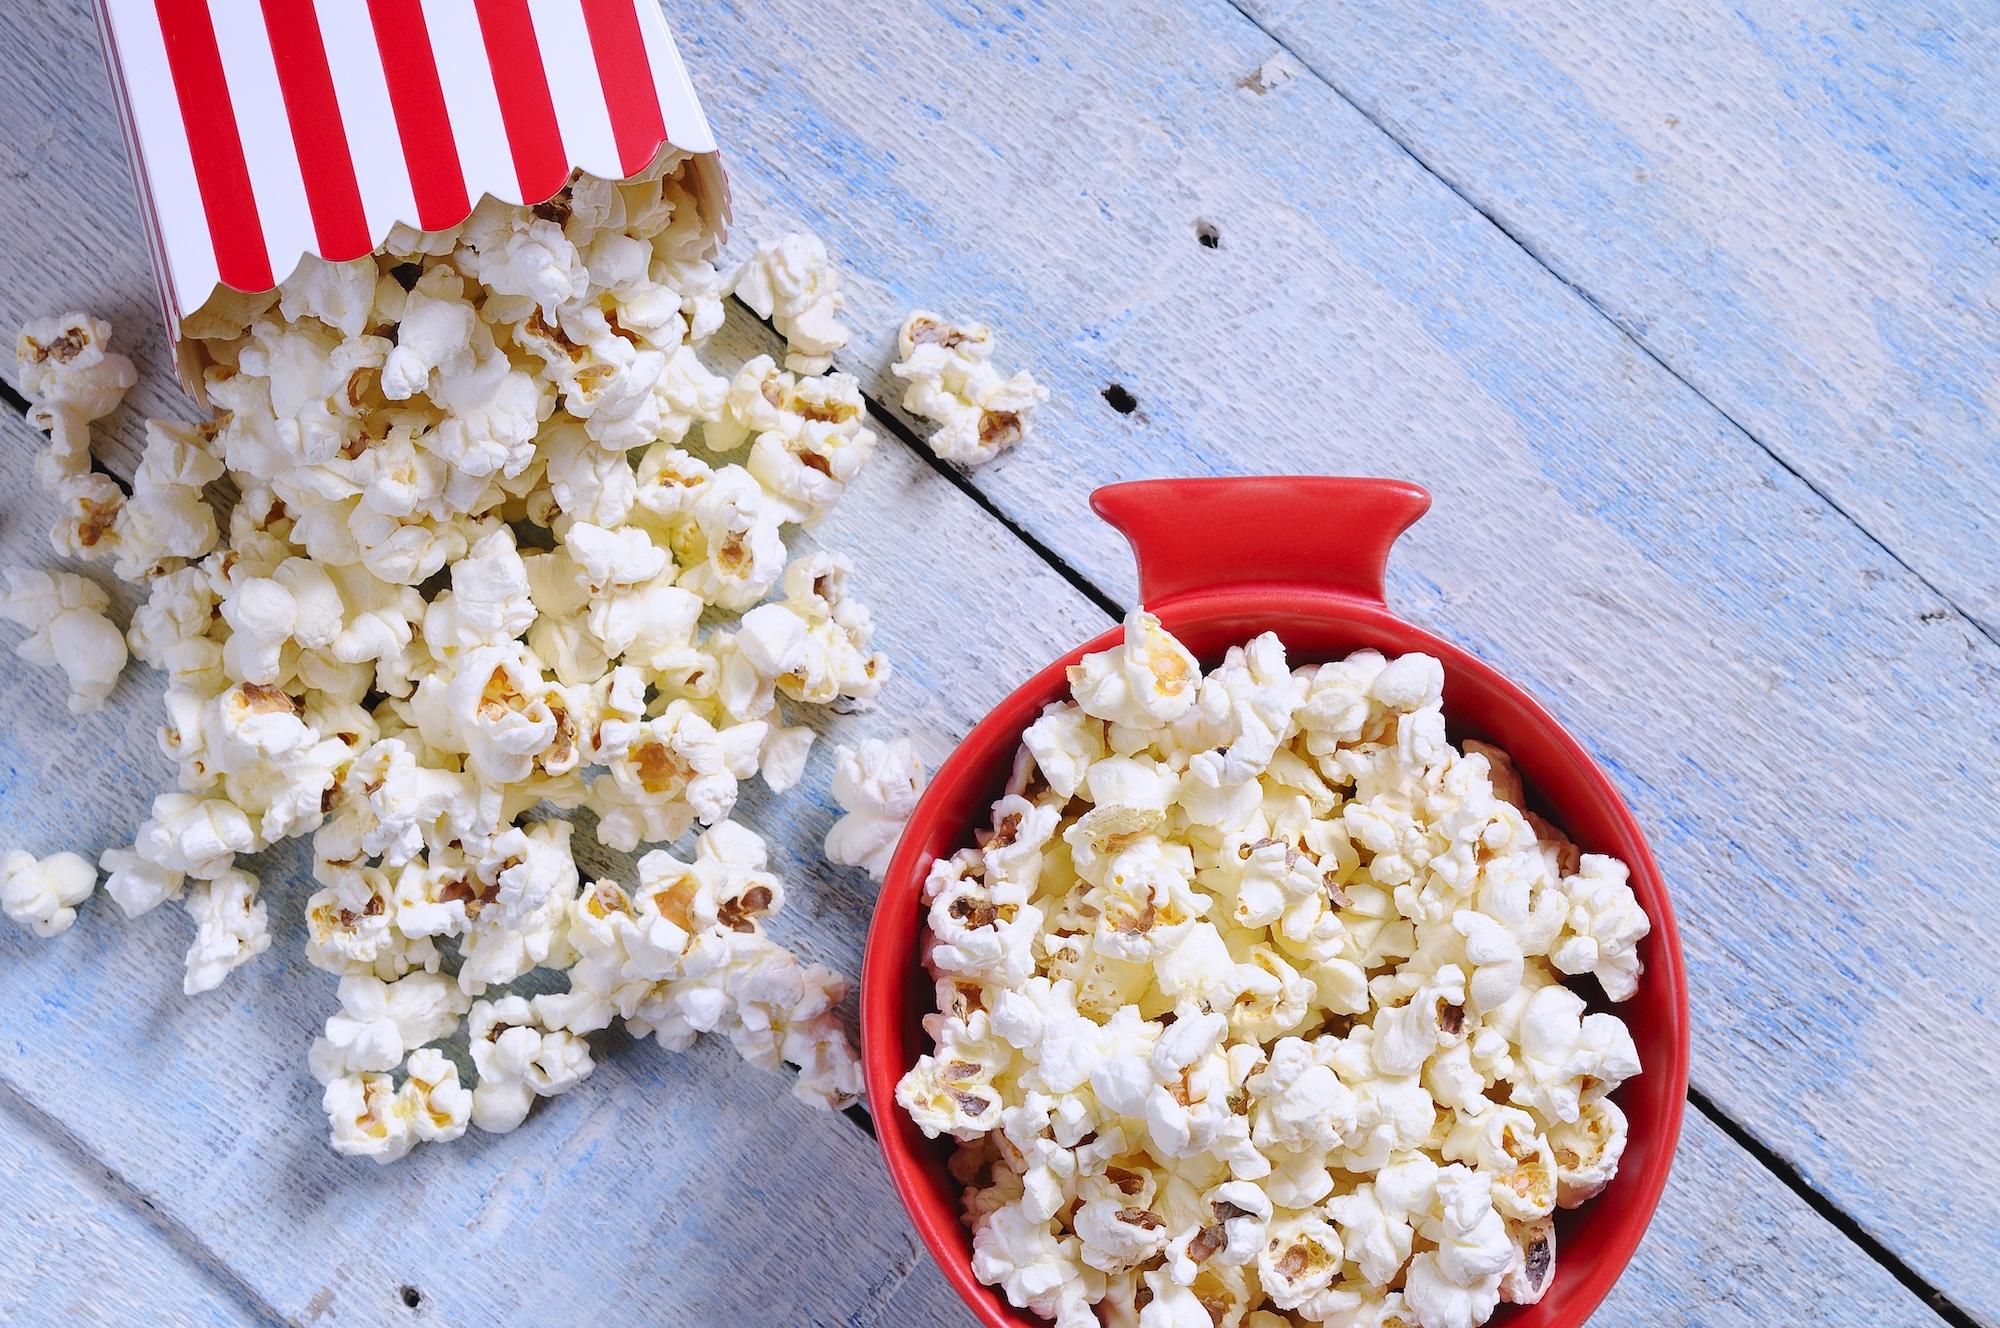 Overhead view of popcorn